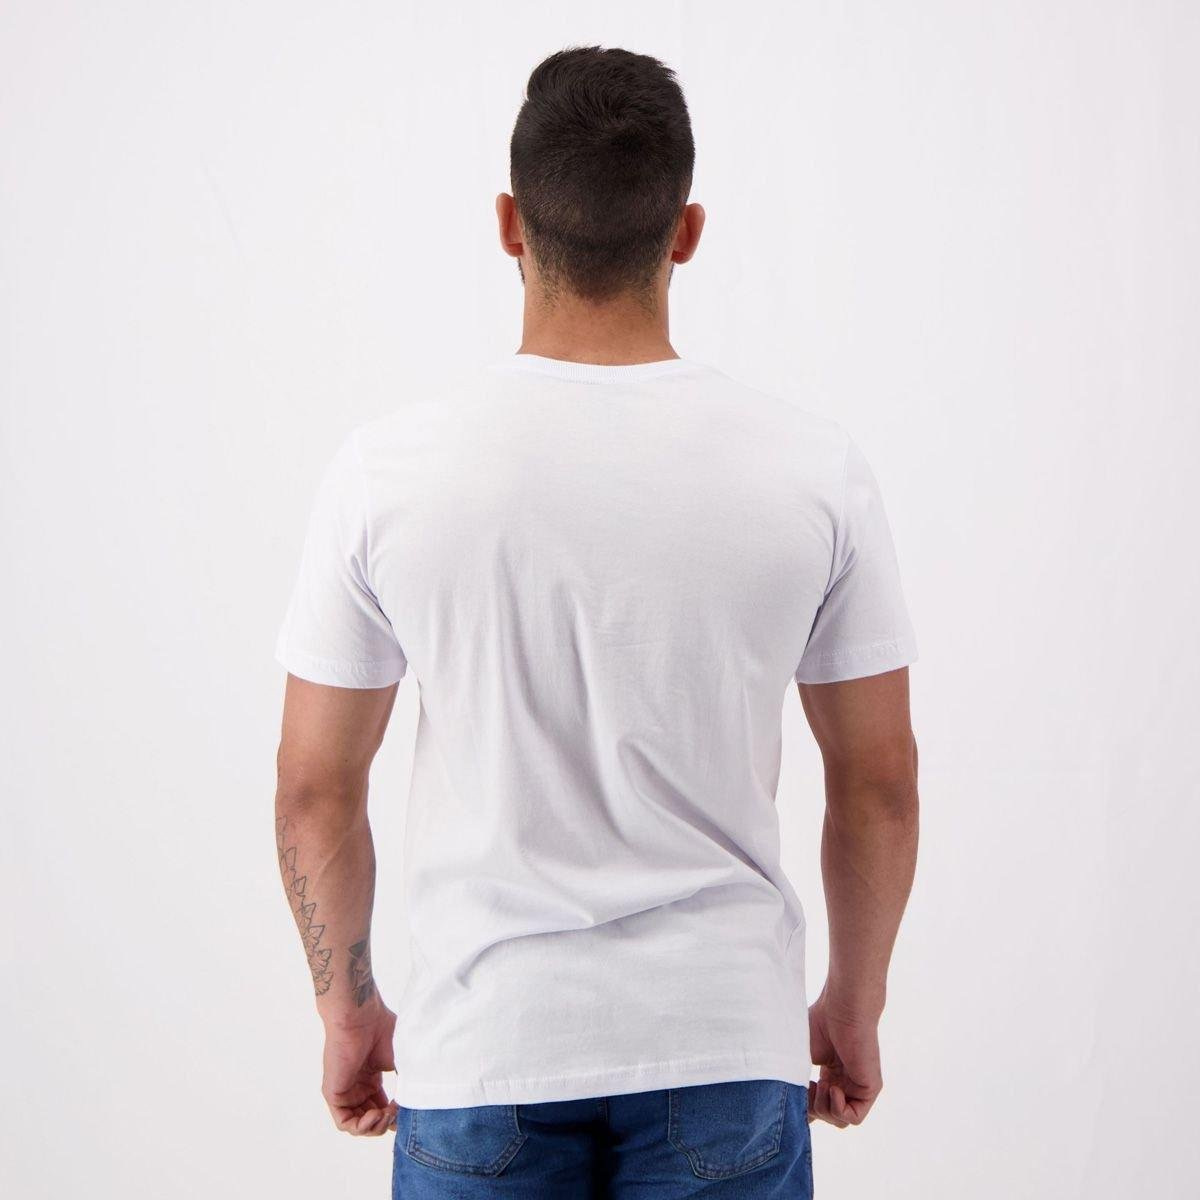 Camiseta Ecko Infamous Masculina - Branco